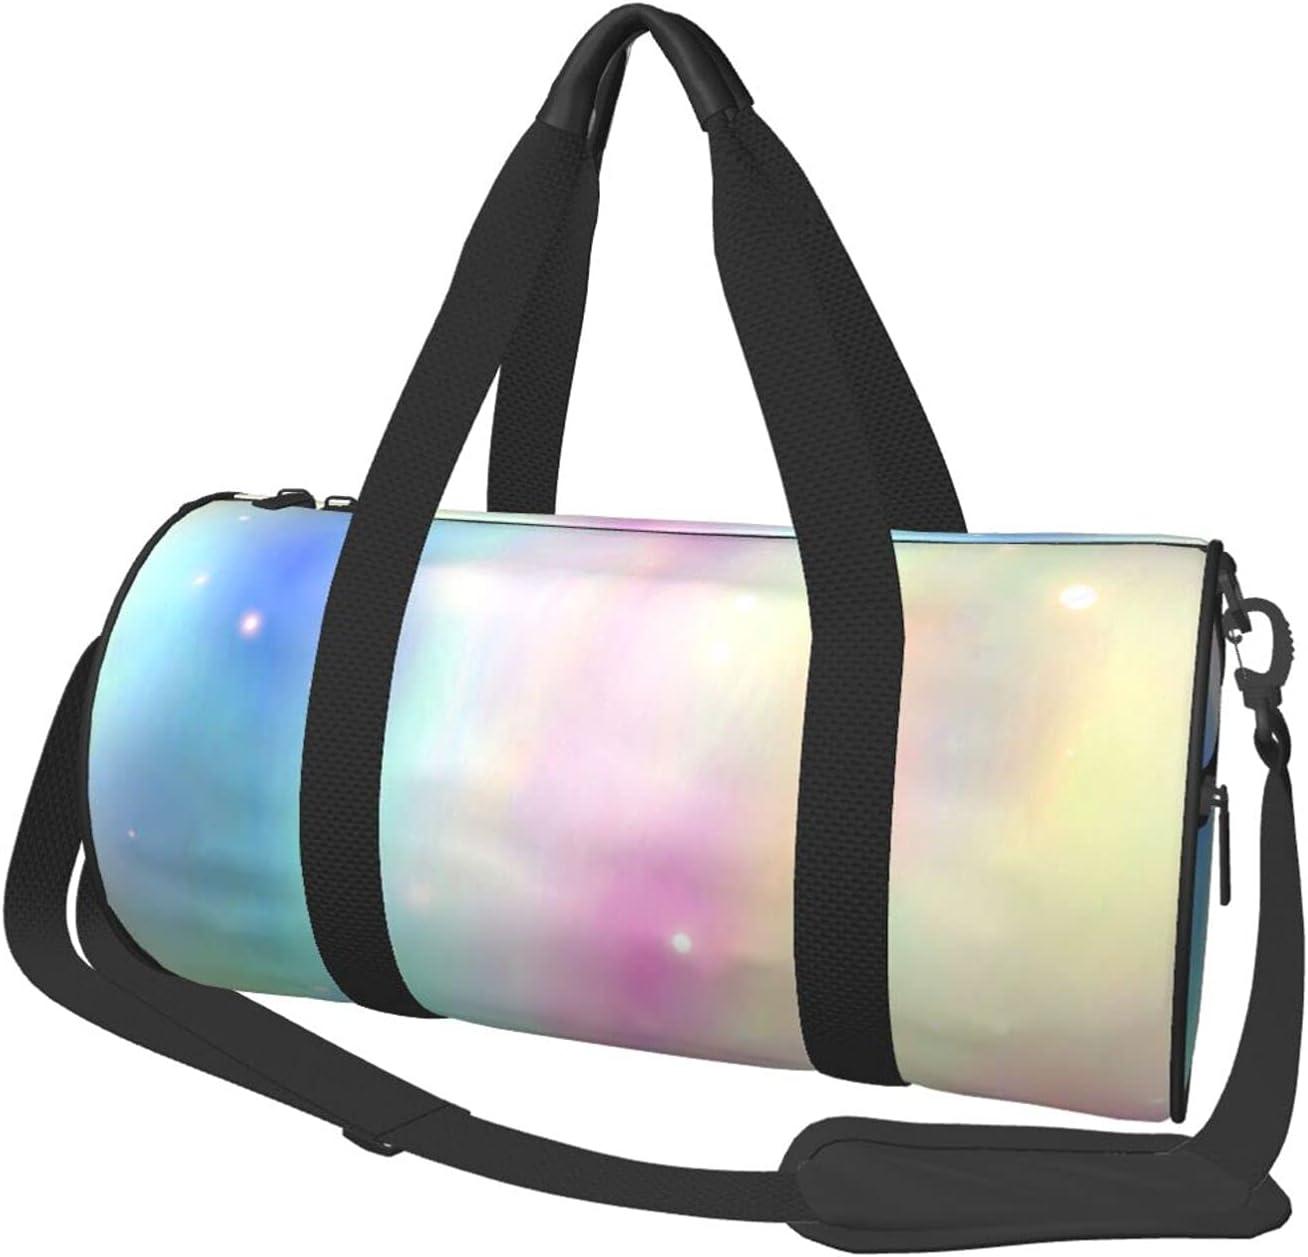 NCHOME Duffel Bag Wonderful Rainbow Sports Round Bags Low price Virginia Beach Mall Yo Texture